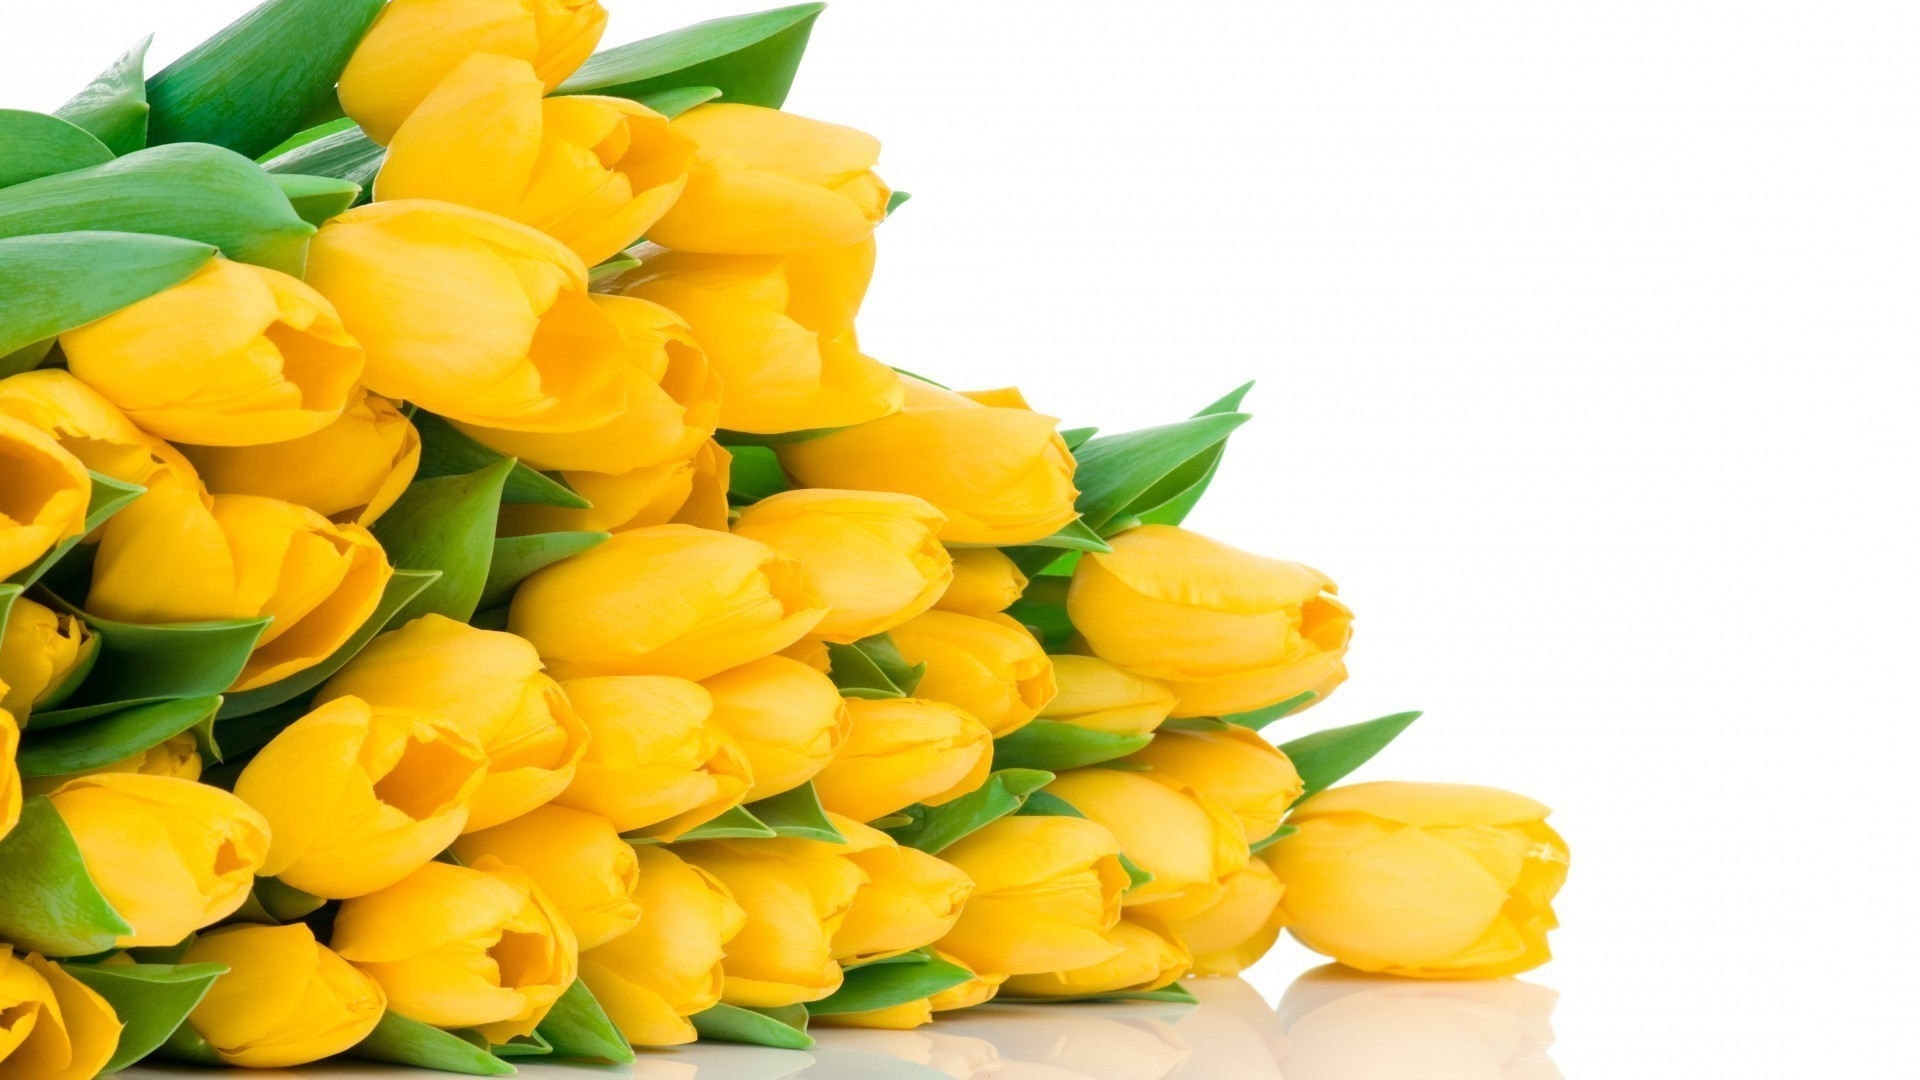 International Women's Day Flowers image theme